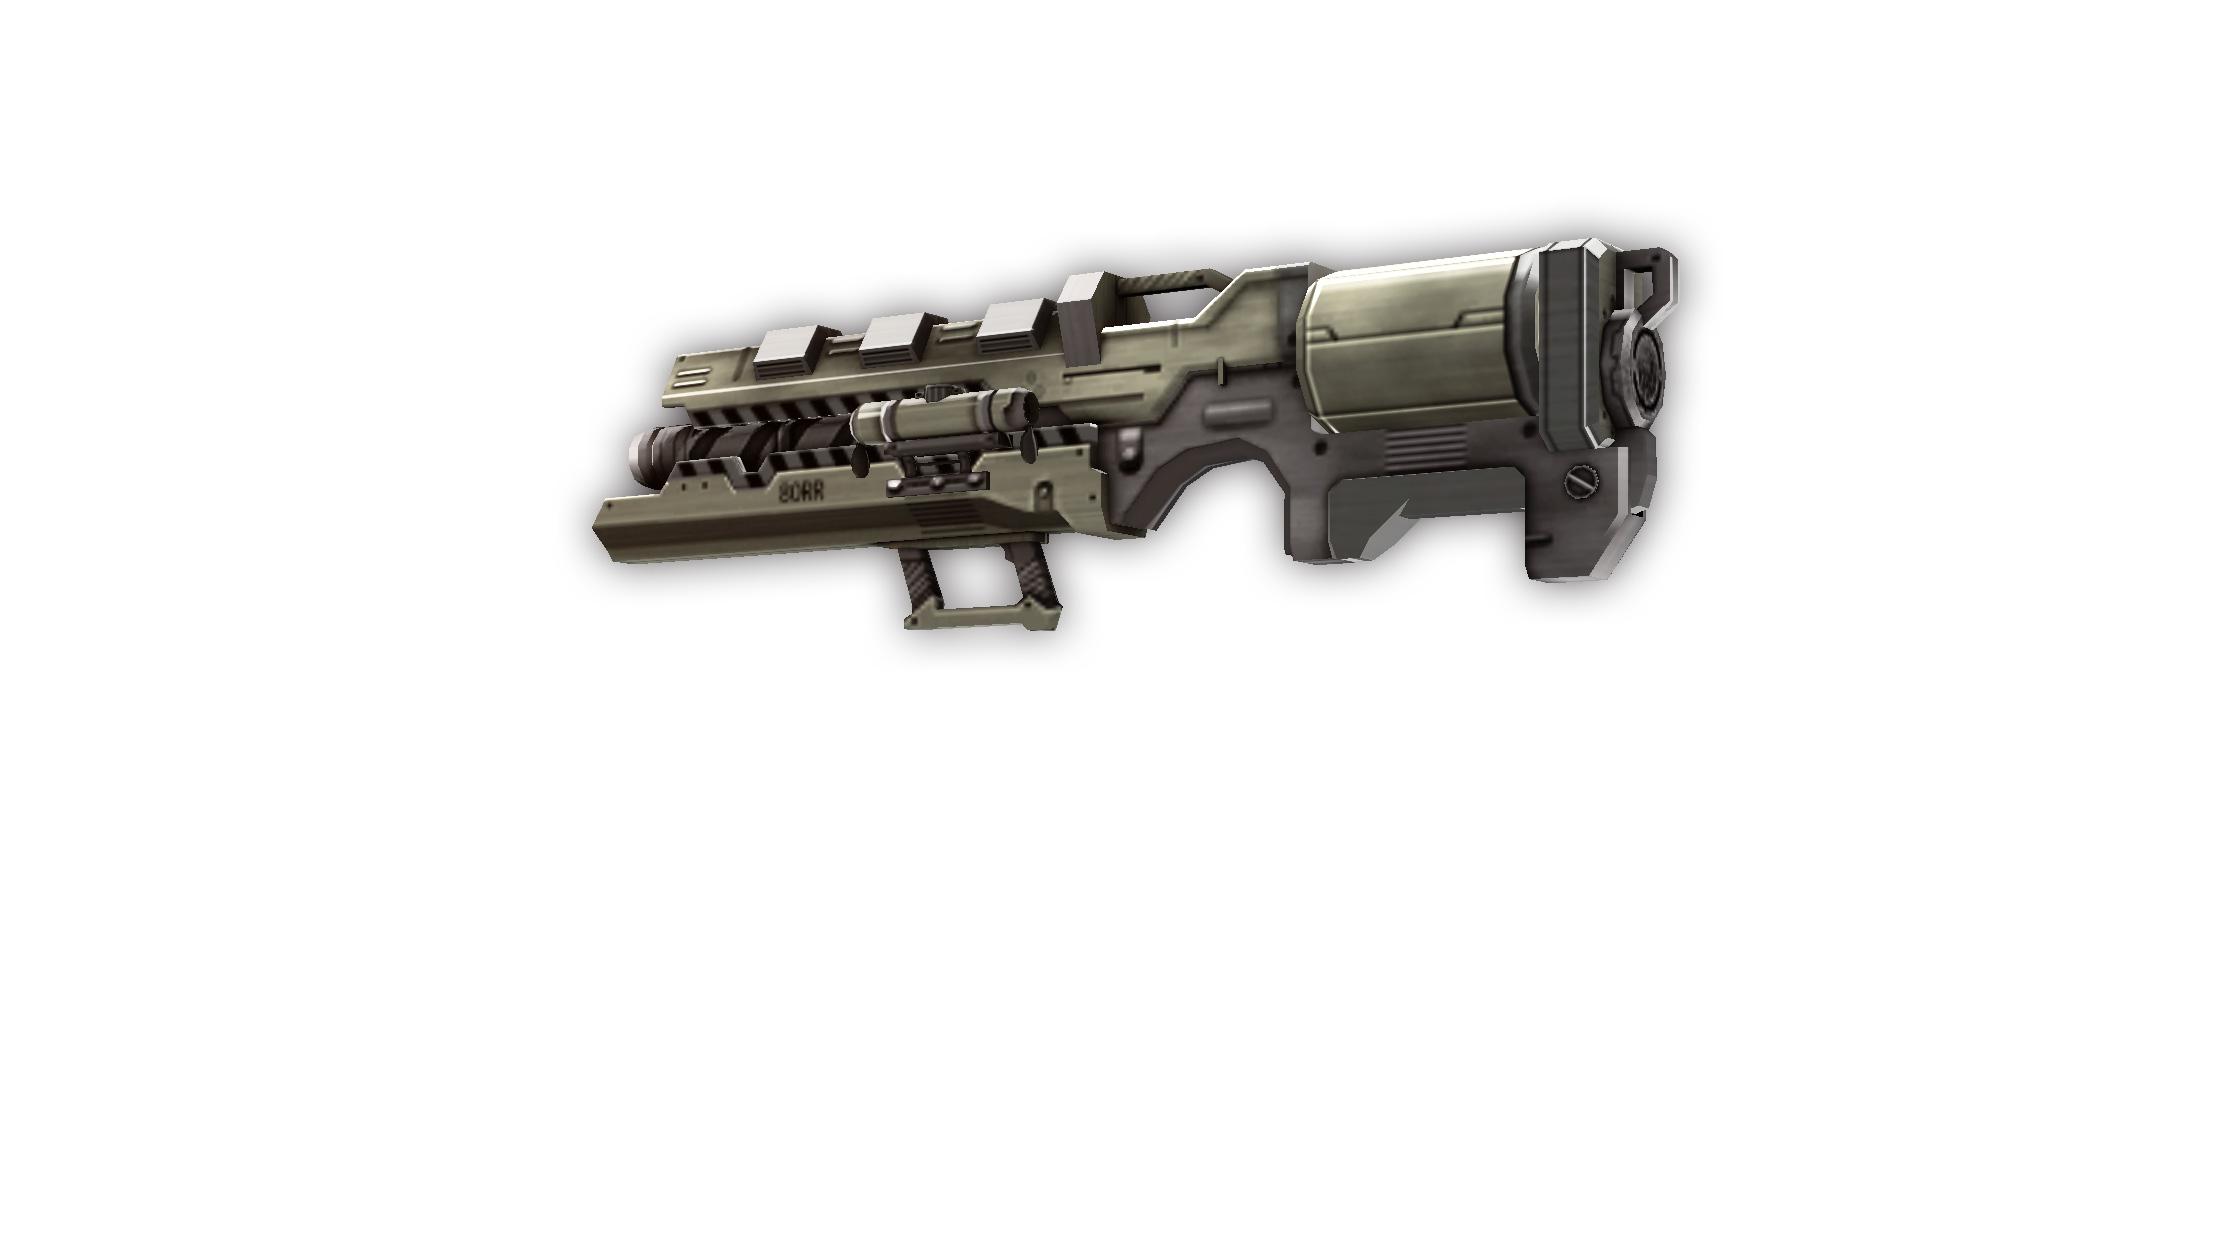 FREEDOM_WARS_Rocket Launcher